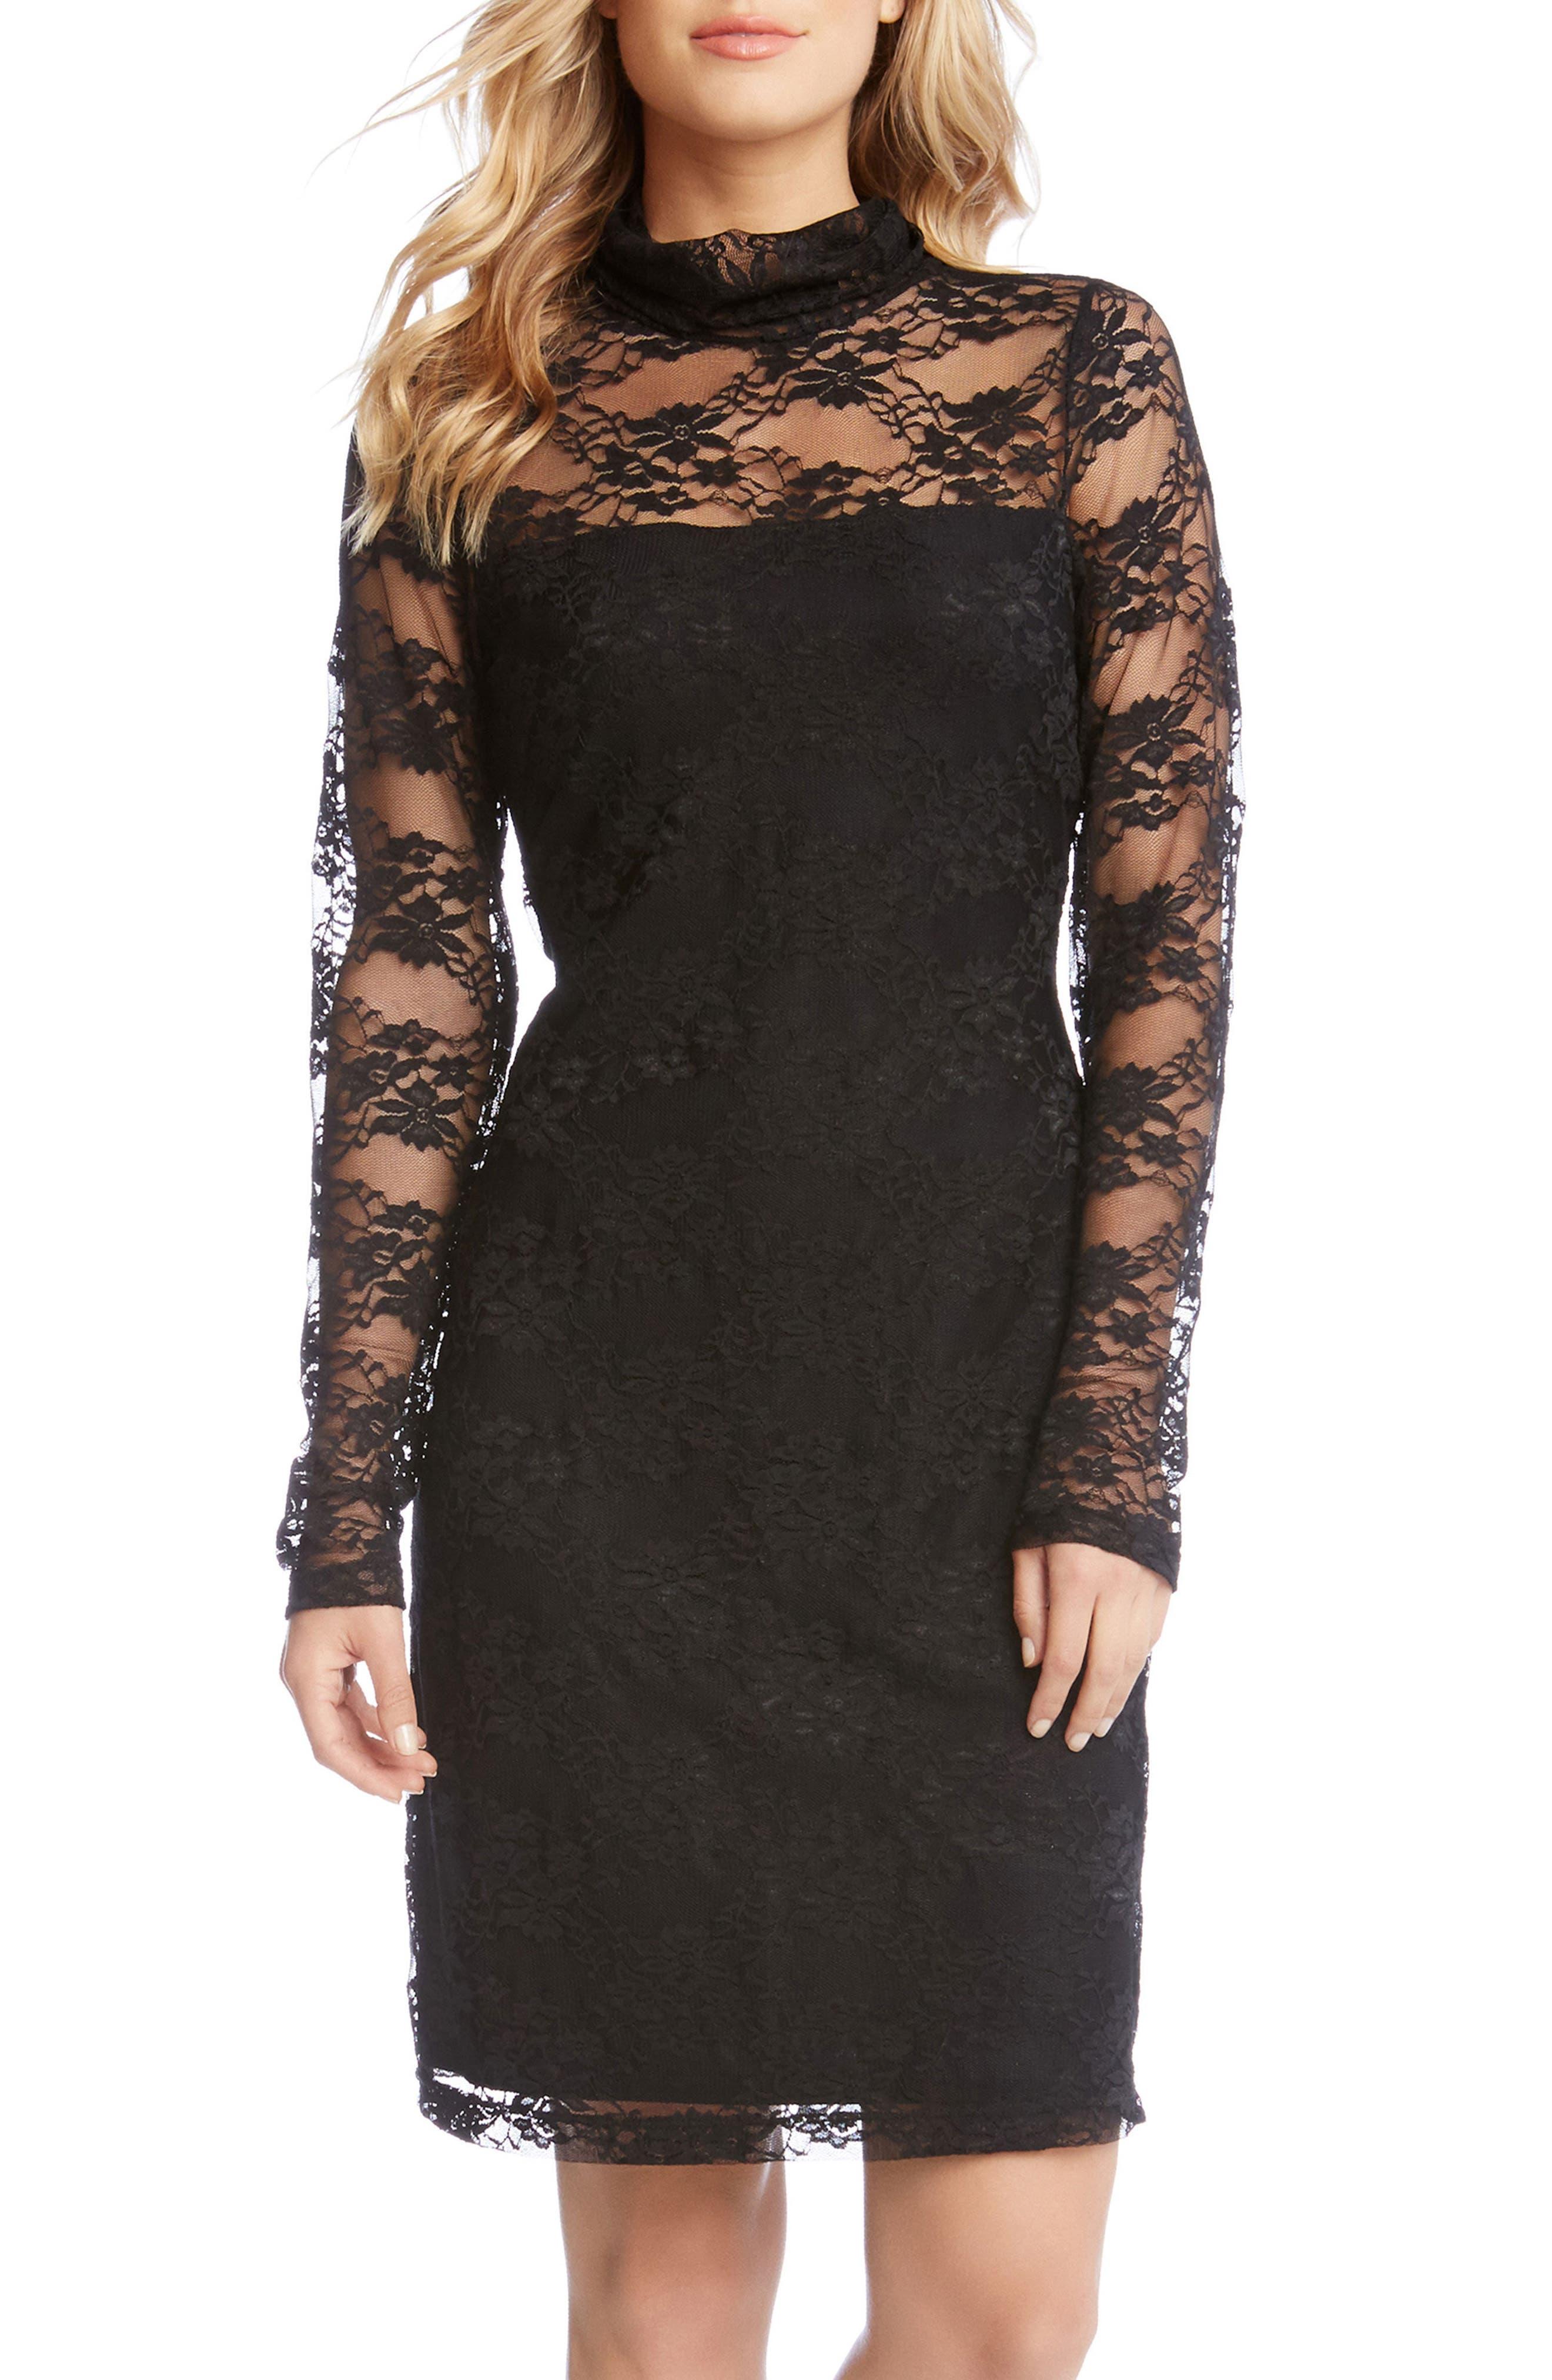 Turtleneck Lace Sheath Dress,                             Main thumbnail 1, color,                             Black